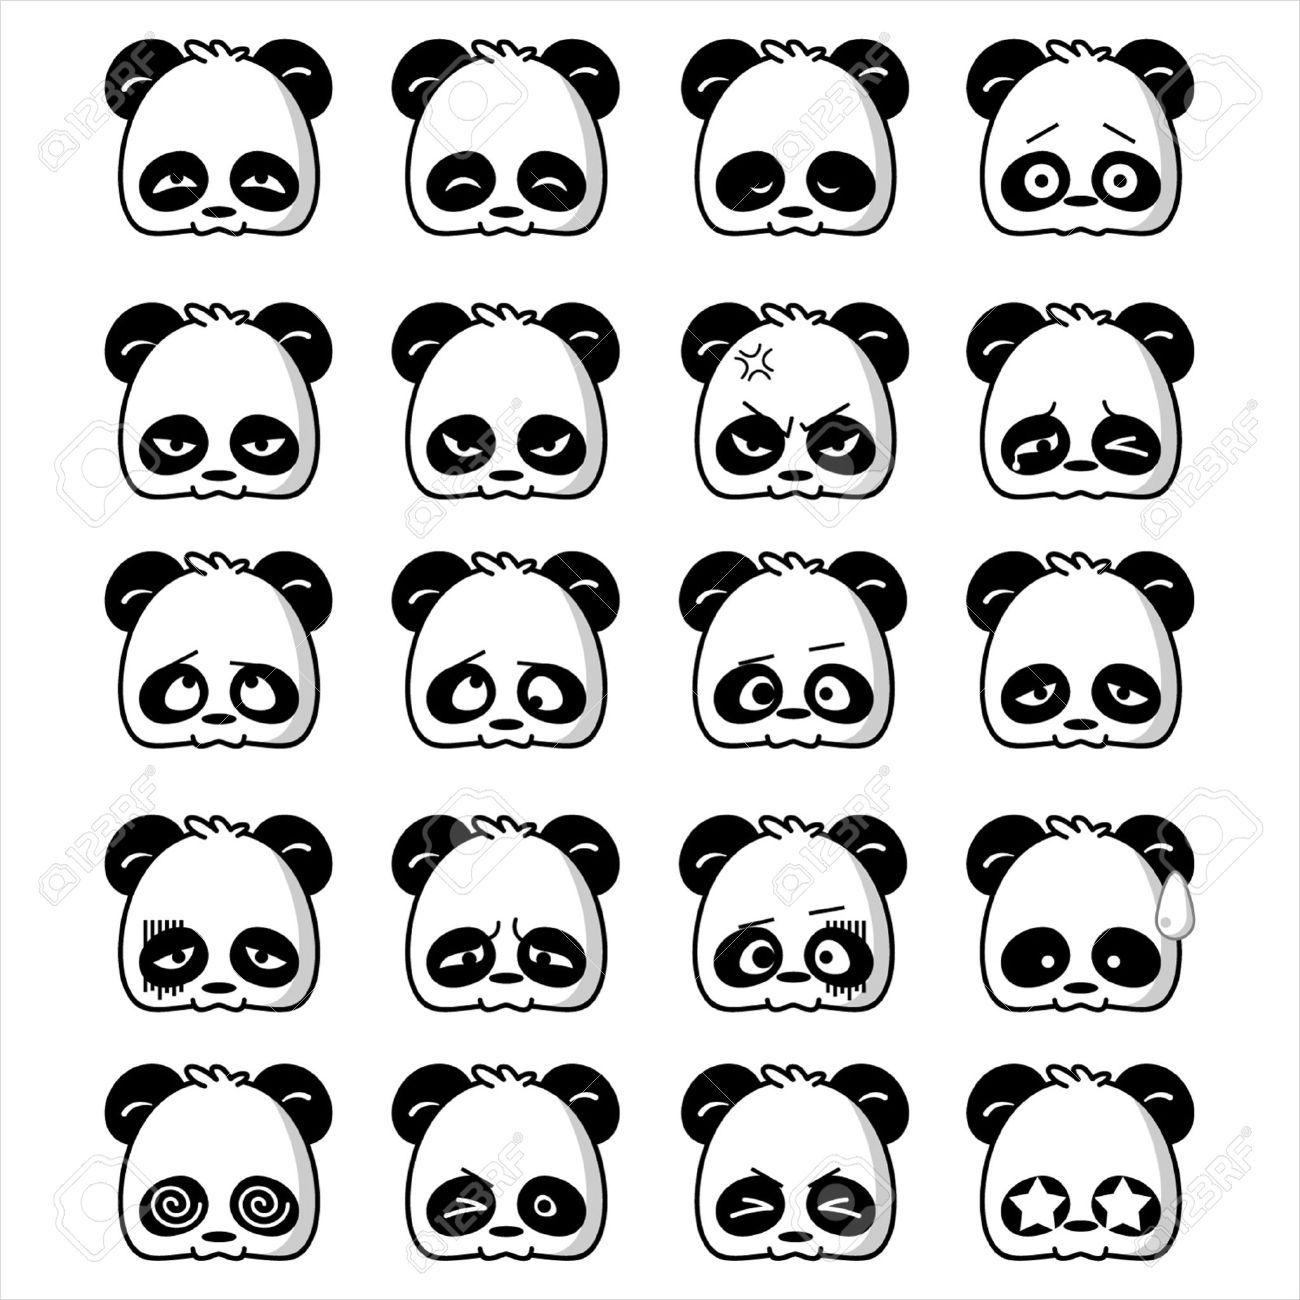 Cute And Cool Pandas Cartoon